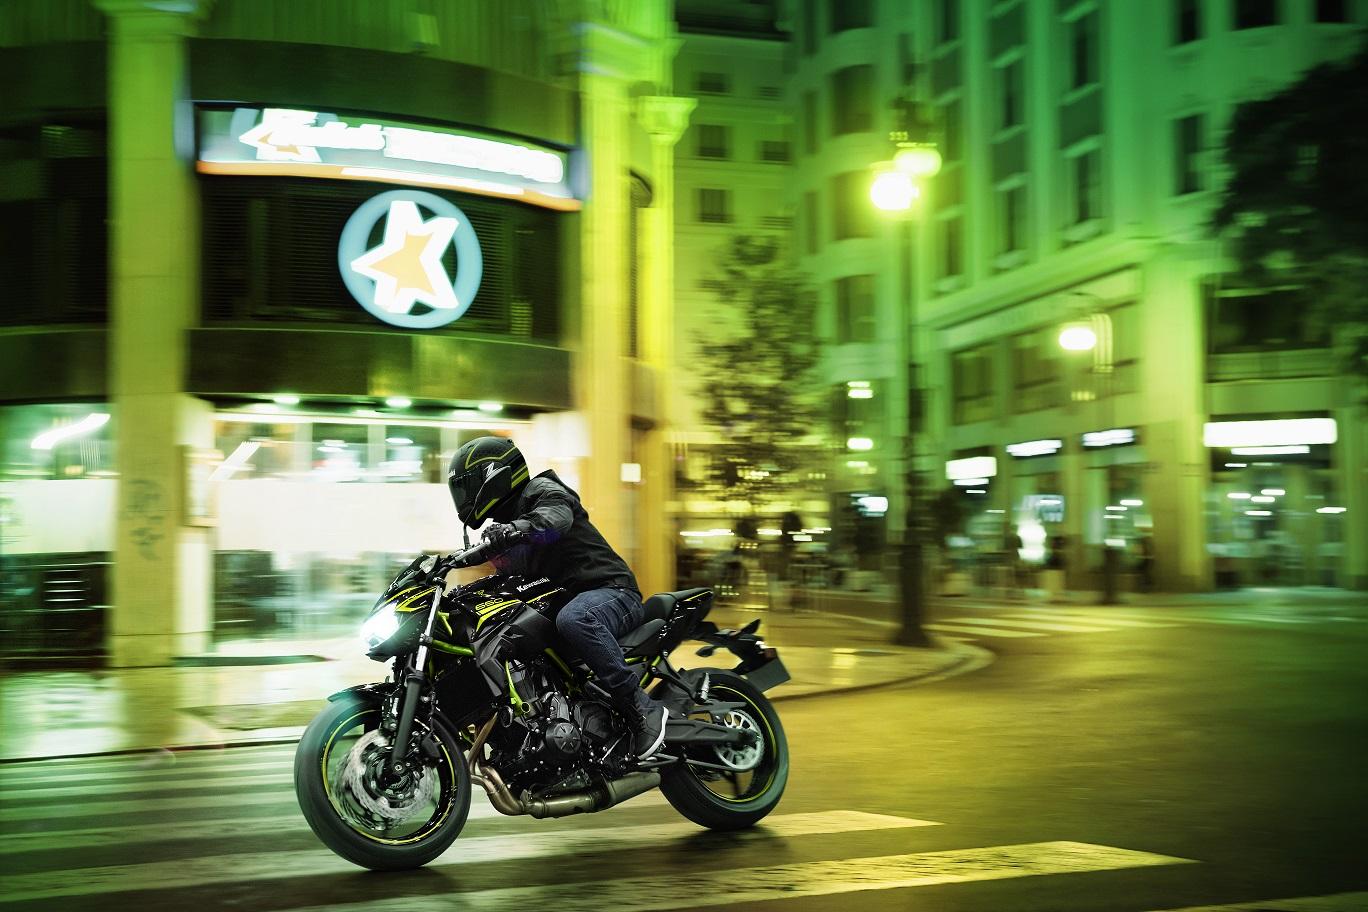 Kawasaki Ζ650: To 2020 έρχεται πλήρως εξοπλισμένη με νέα χαρακτηριστικά!